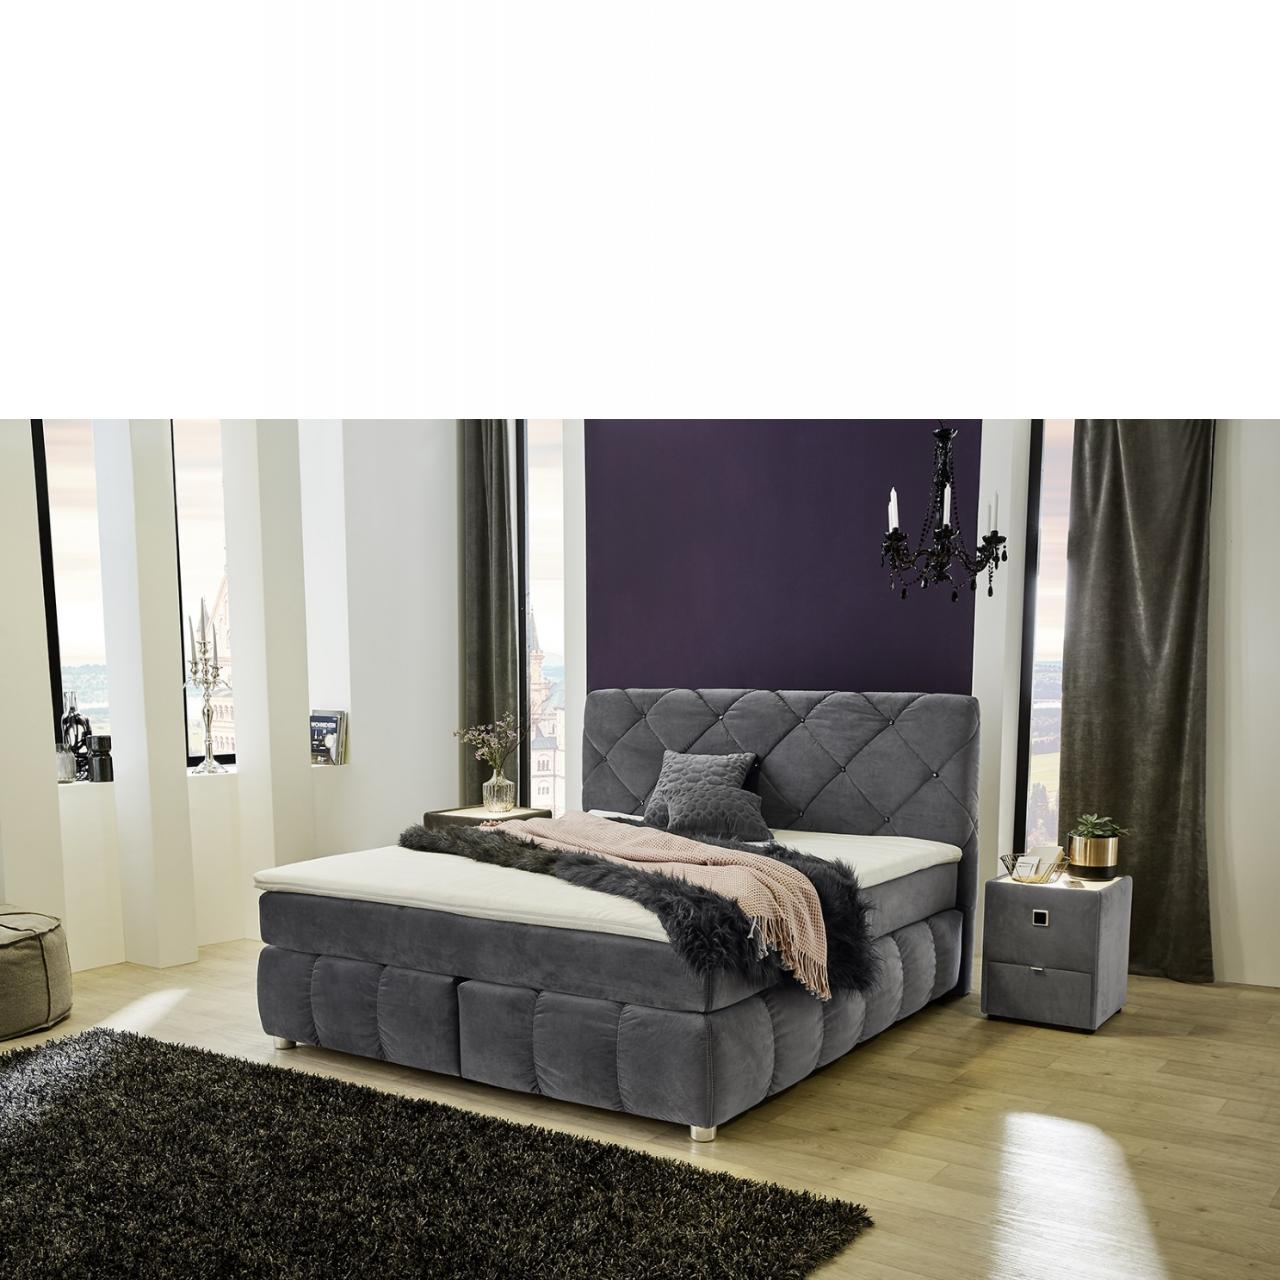 boxspringbett bella boxspringbett betten schlafen m bel j hnichen center gmbh. Black Bedroom Furniture Sets. Home Design Ideas